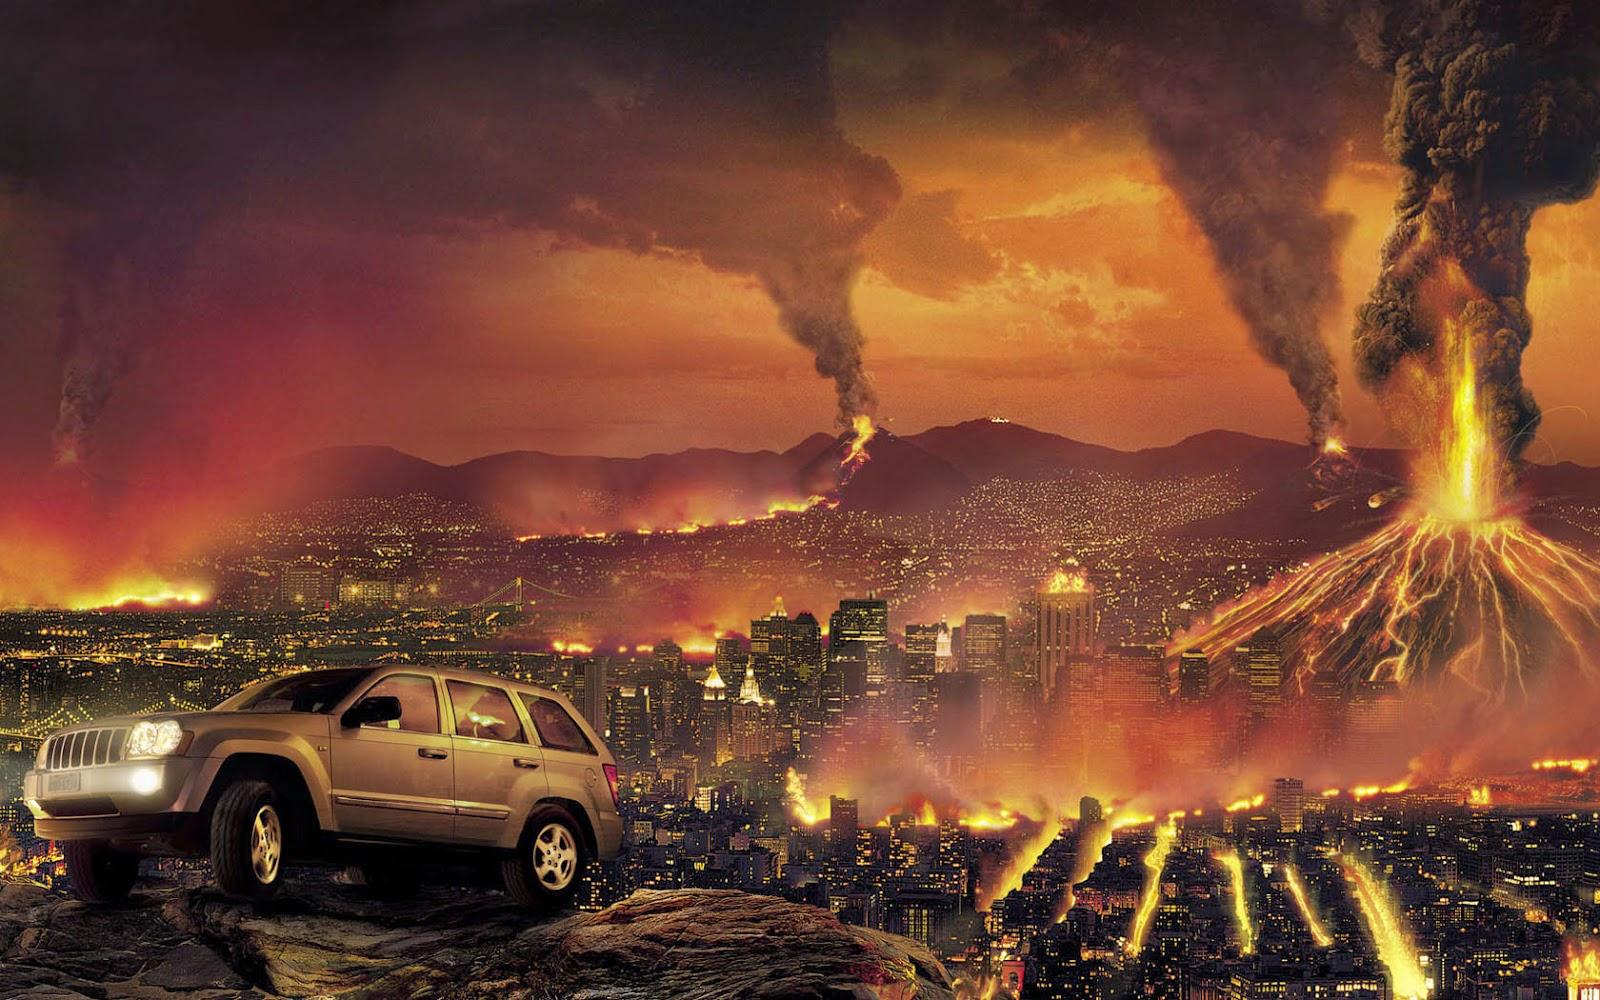 SUV Car Landscape City Destroyed Wallpaper HD, background ...